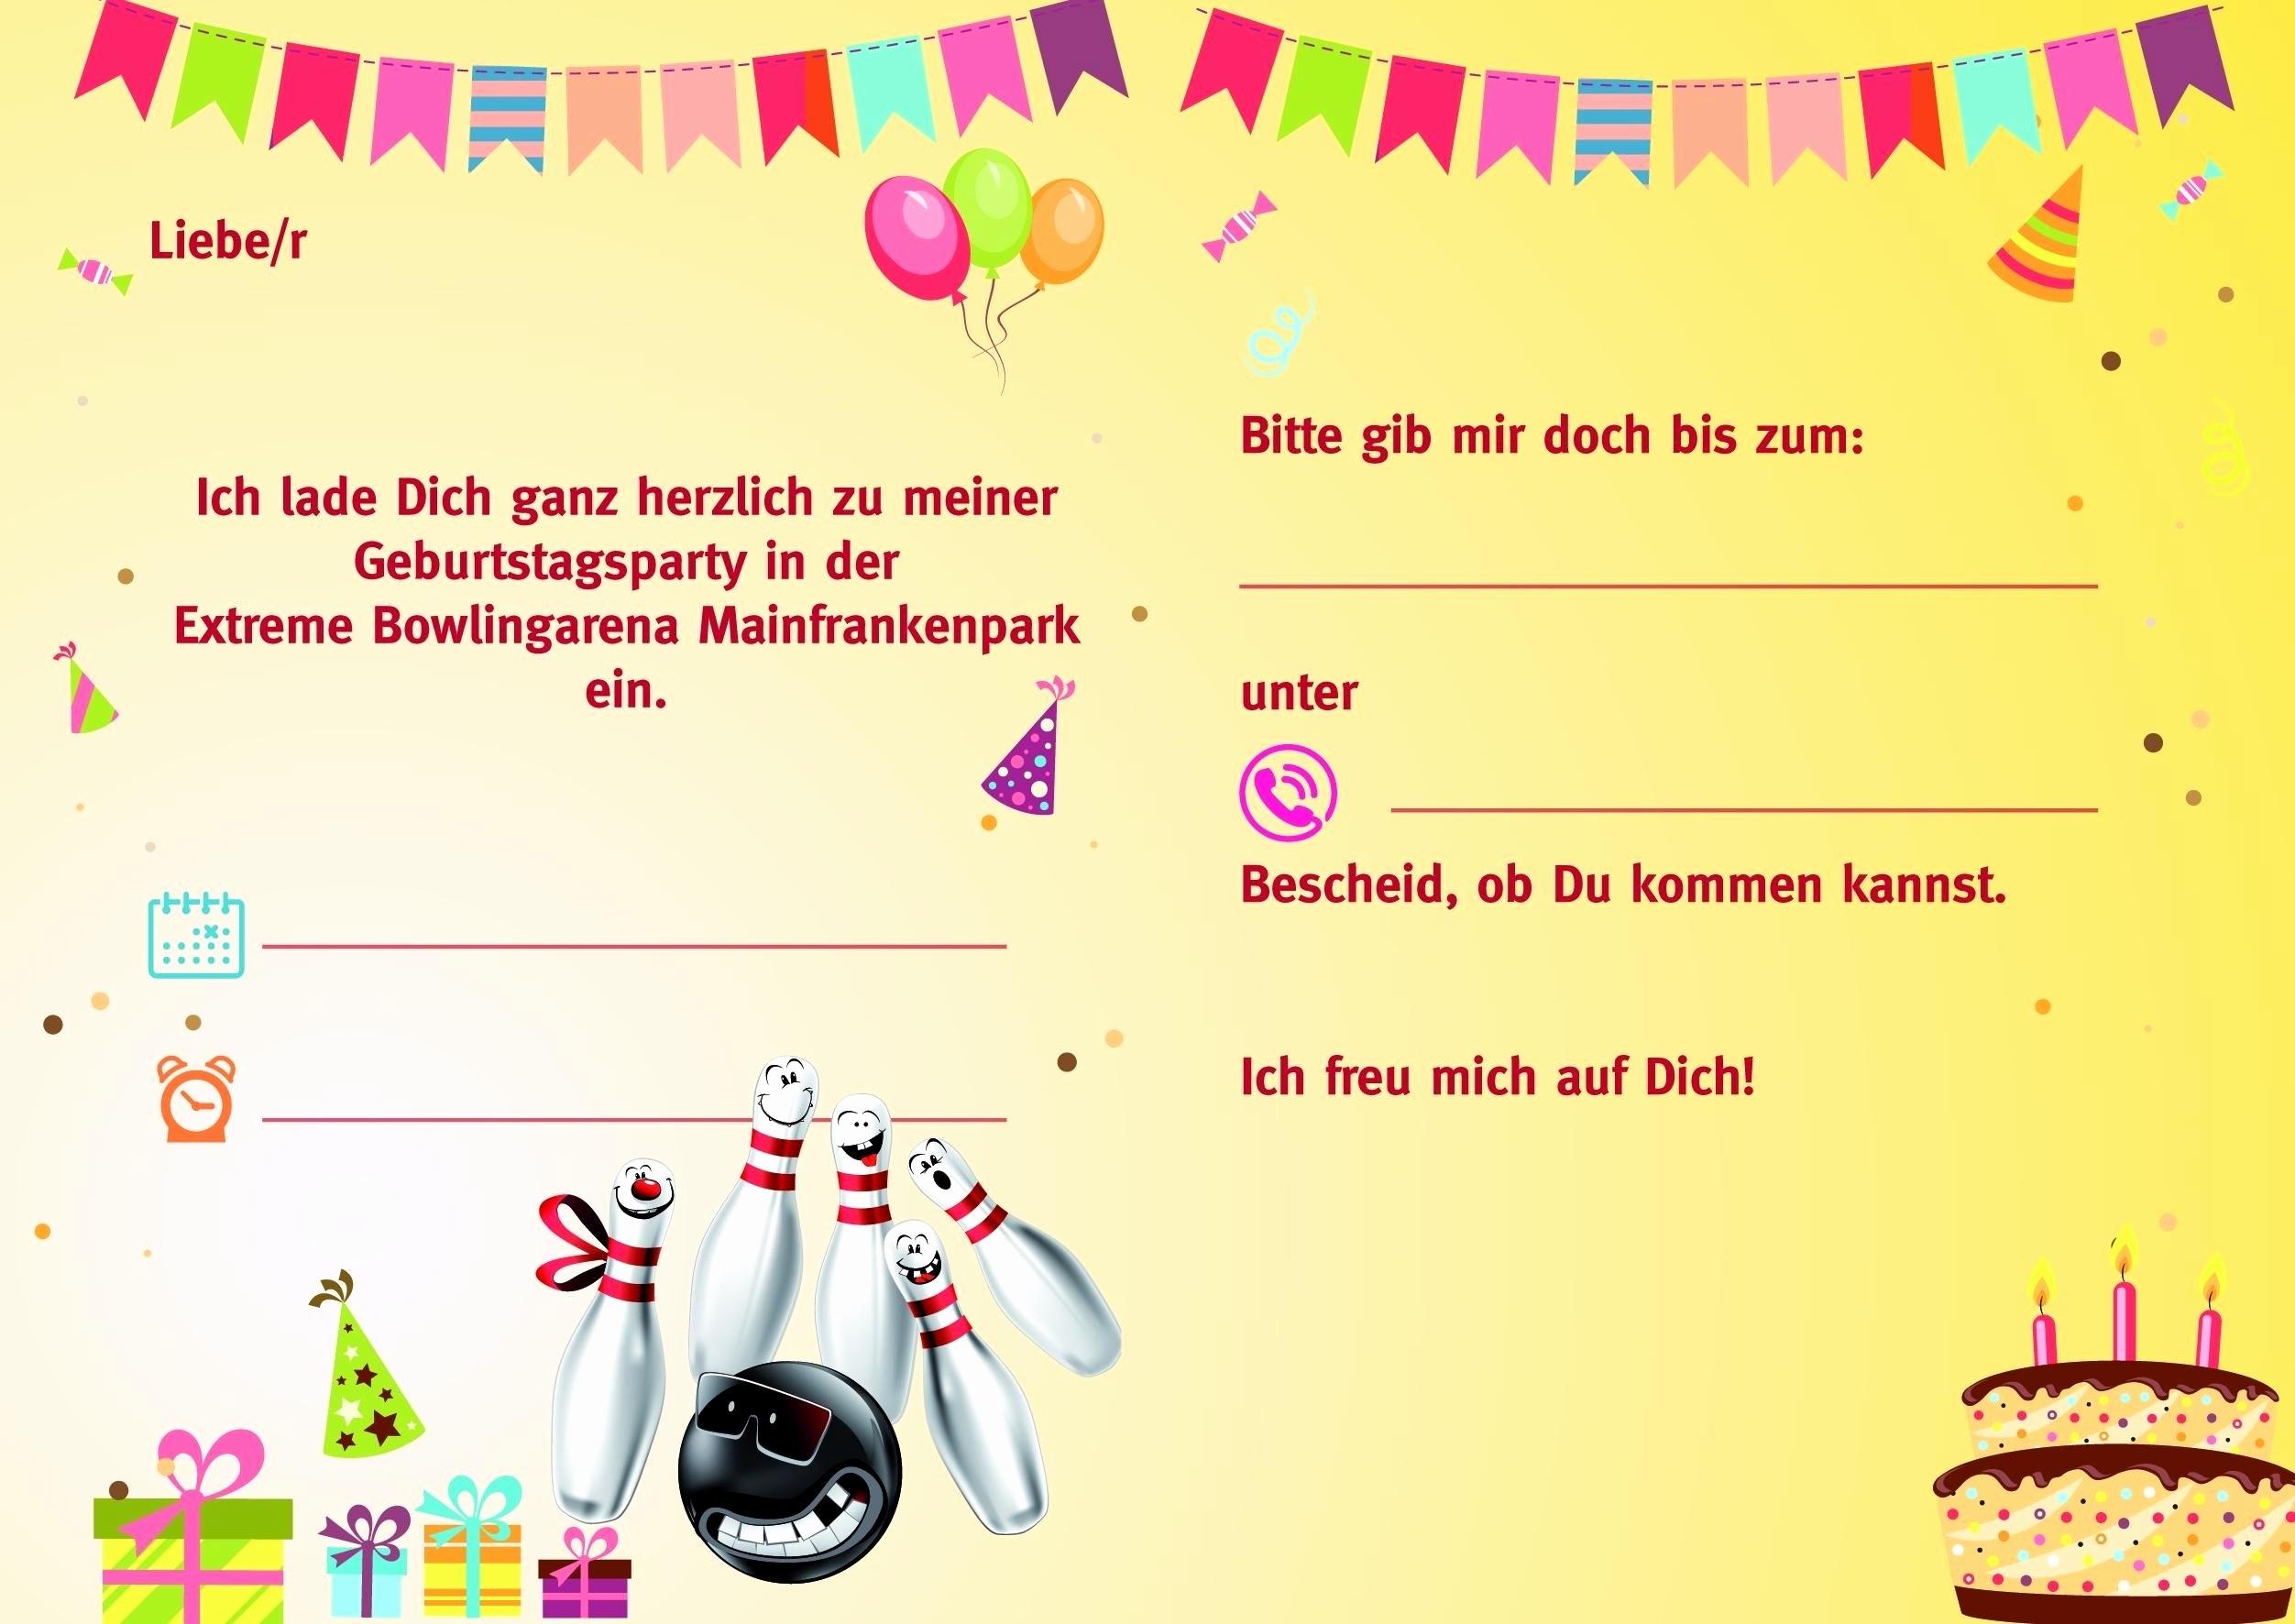 Gratis Geburtstagskarten Zum Ausdrucken Neu Lustige bestimmt für Gratis Geburtstagskarten